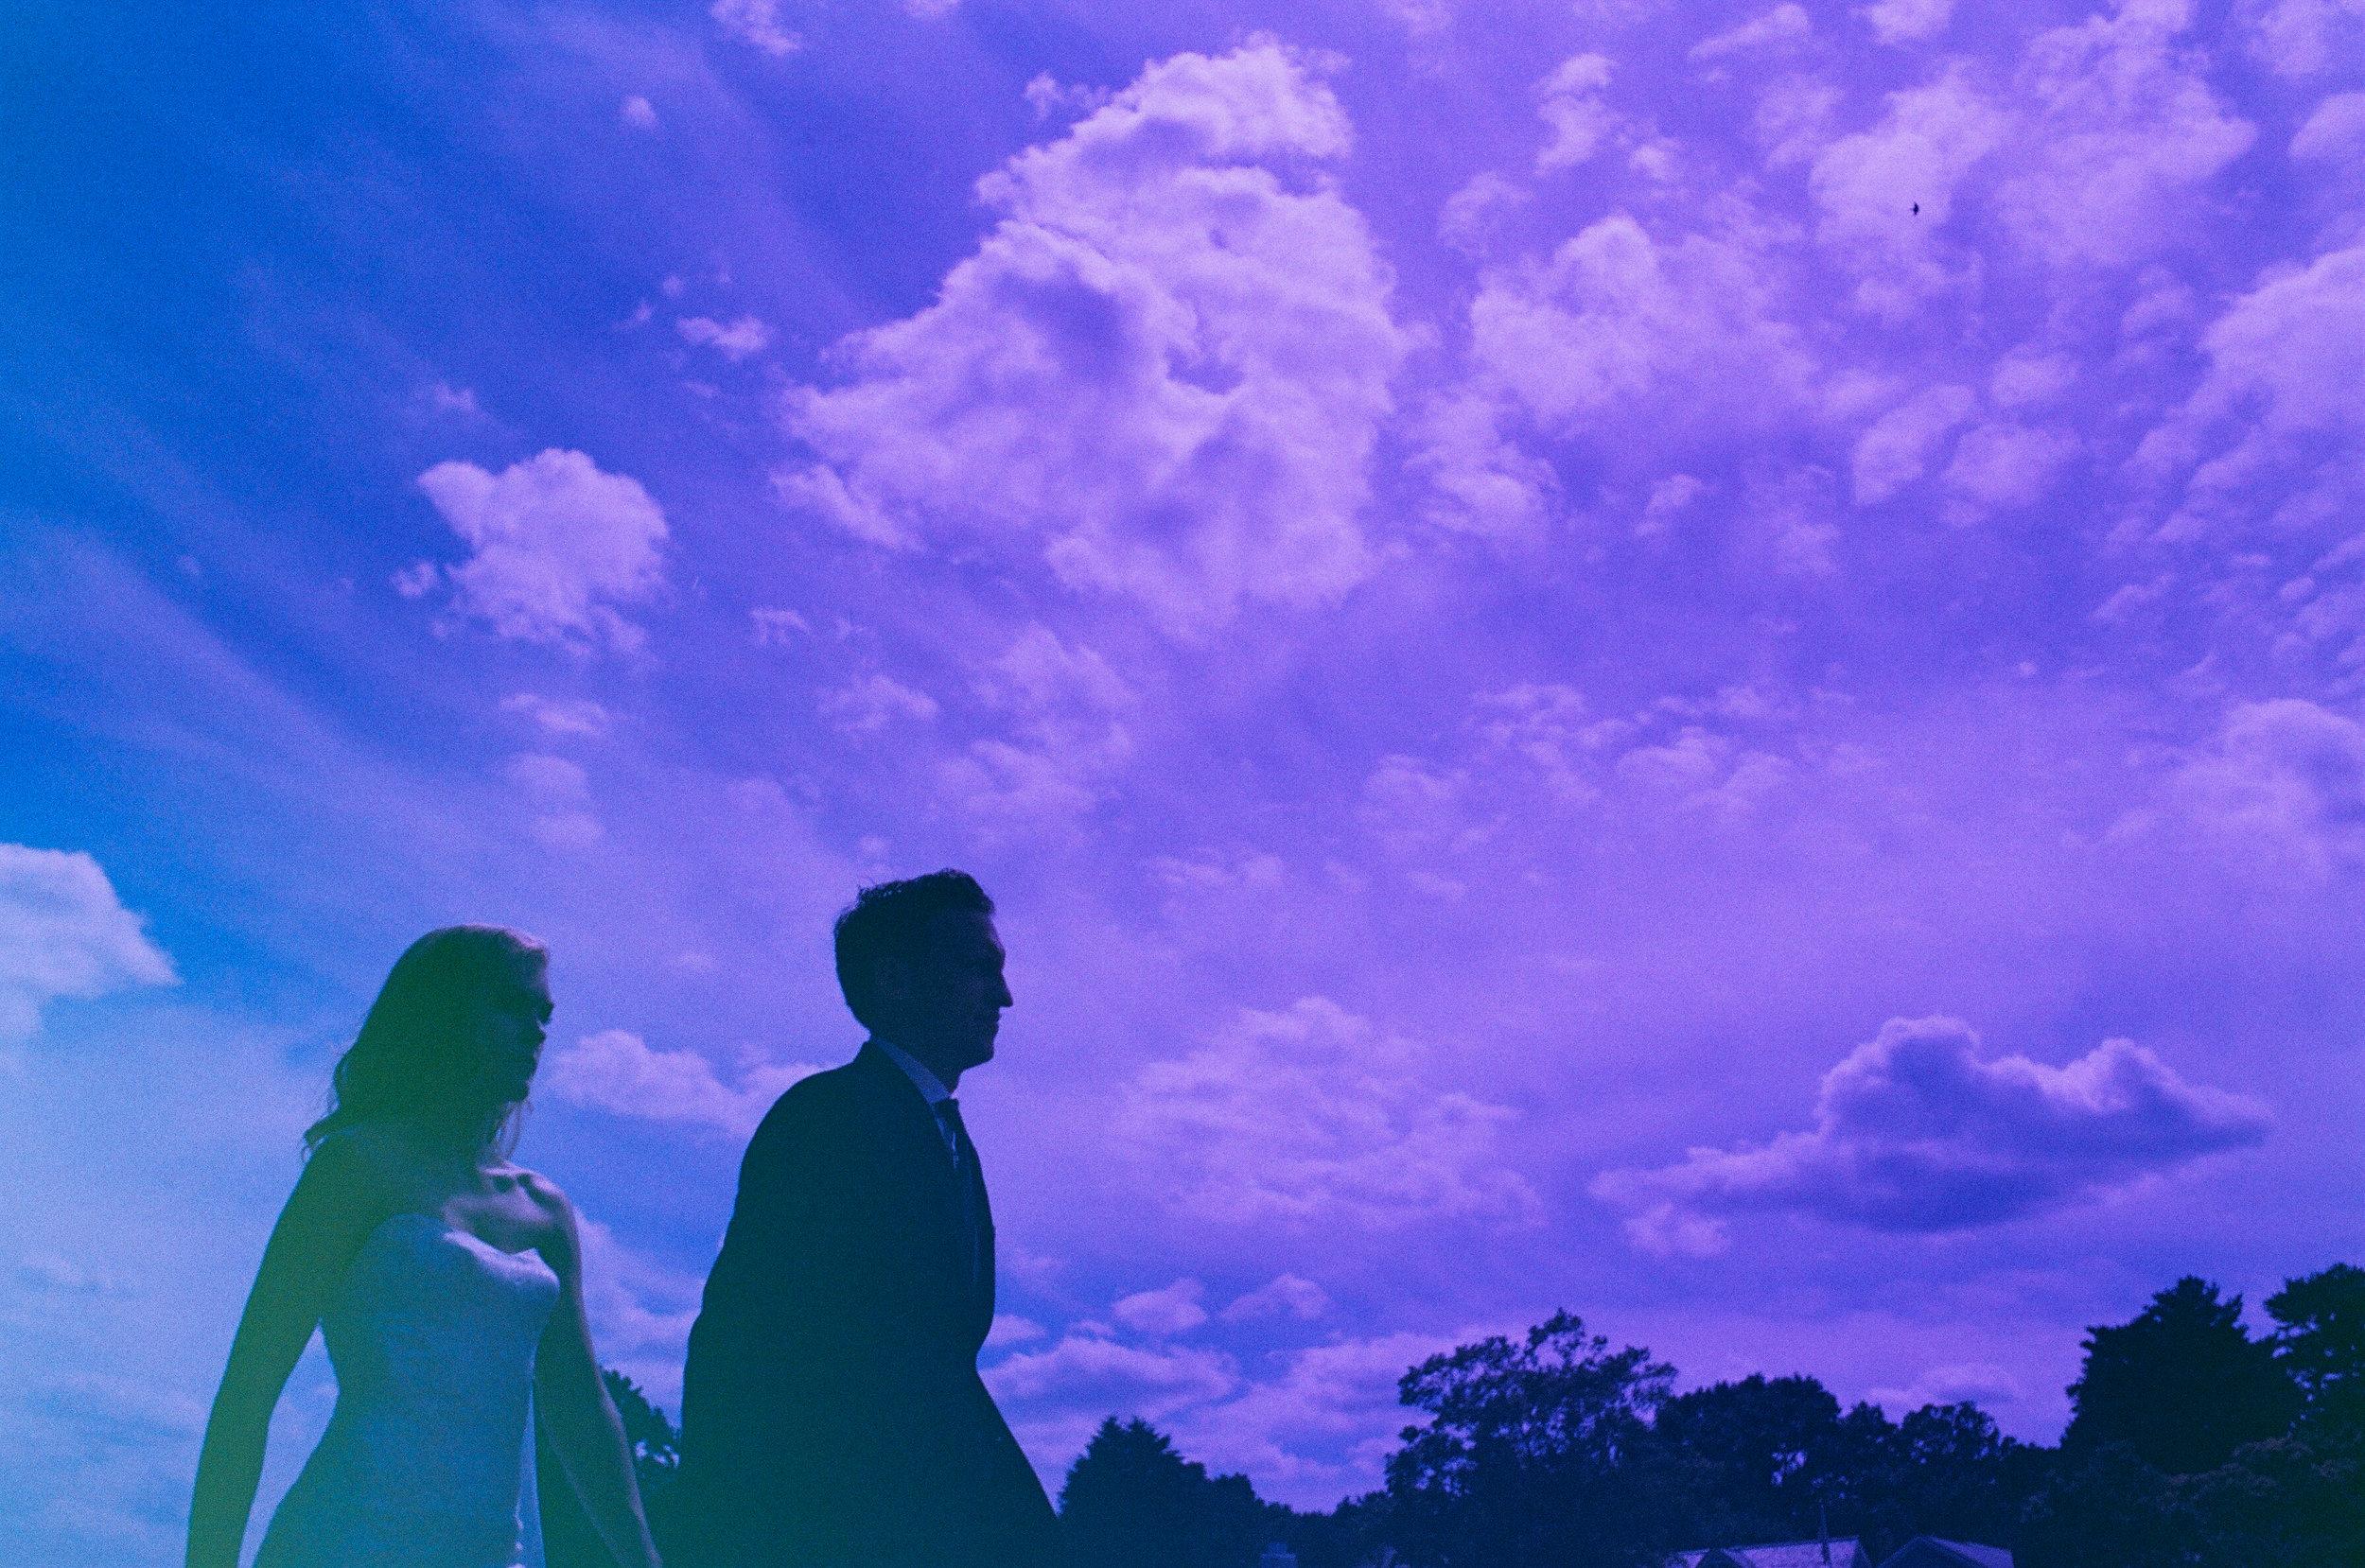 ROWAYTON_LIBRARY_WEDDING_35MM_FILM-5025.jpg